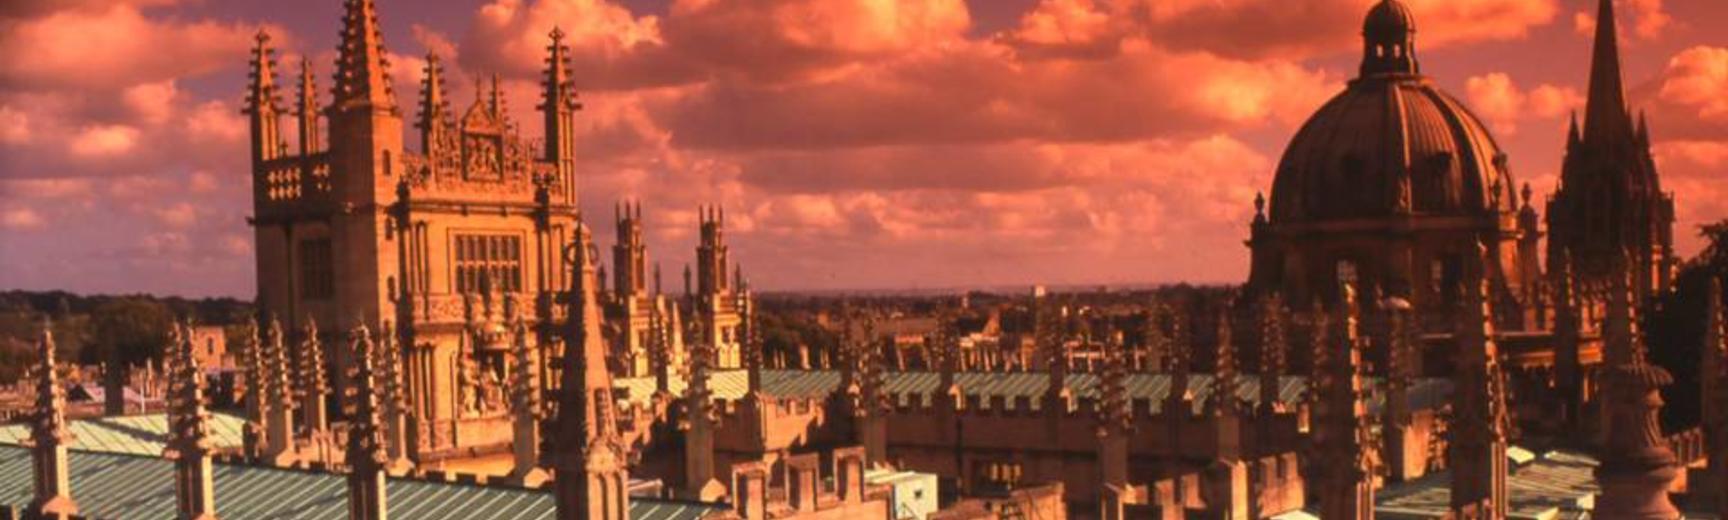 oxford spires in pink sky carousel